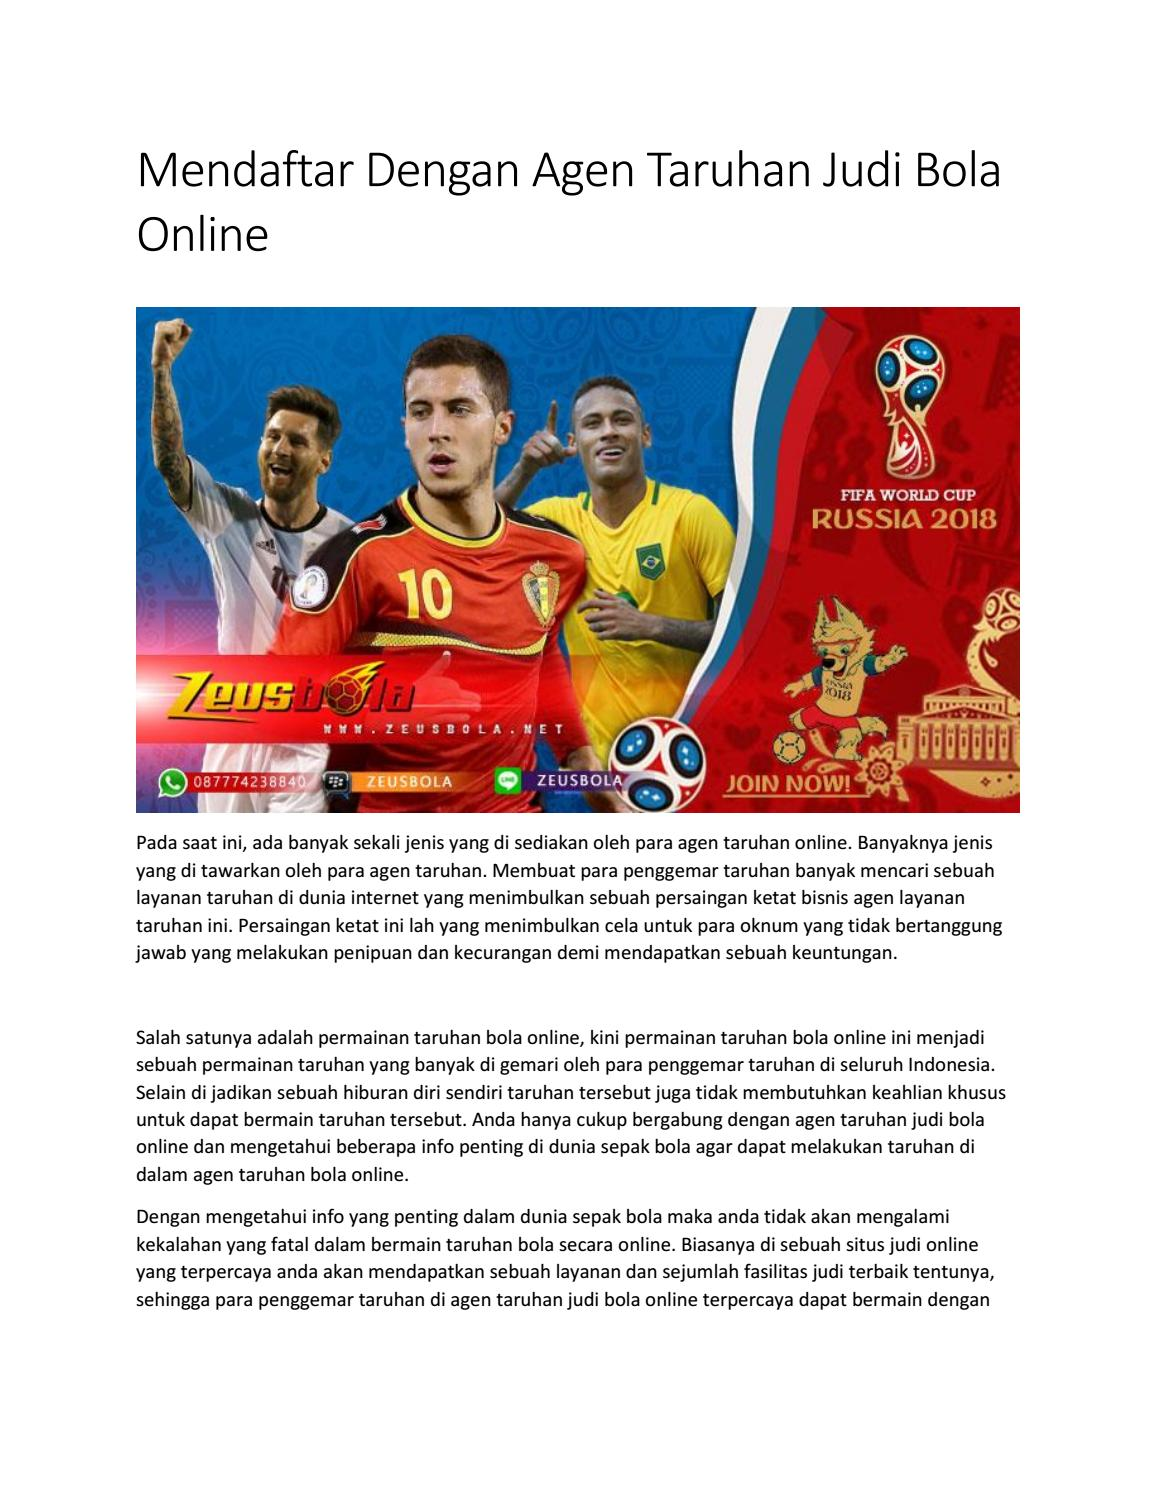 Mendaftar Dengan Agen Taruhan Judi Bola Online By Zeus Issuu